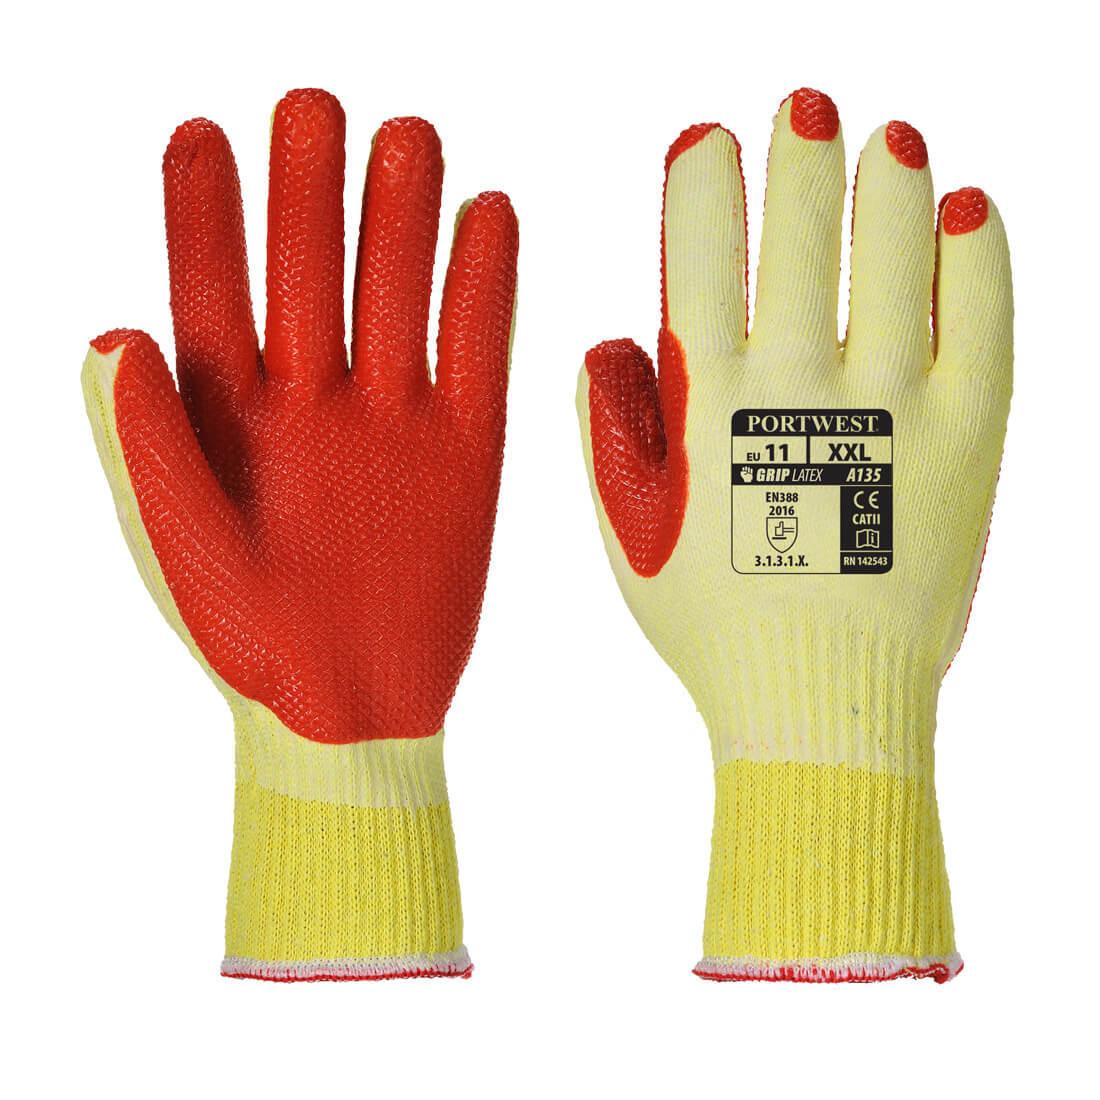 Manusa Tough Grip - Latex - Echipamente de protectie personala